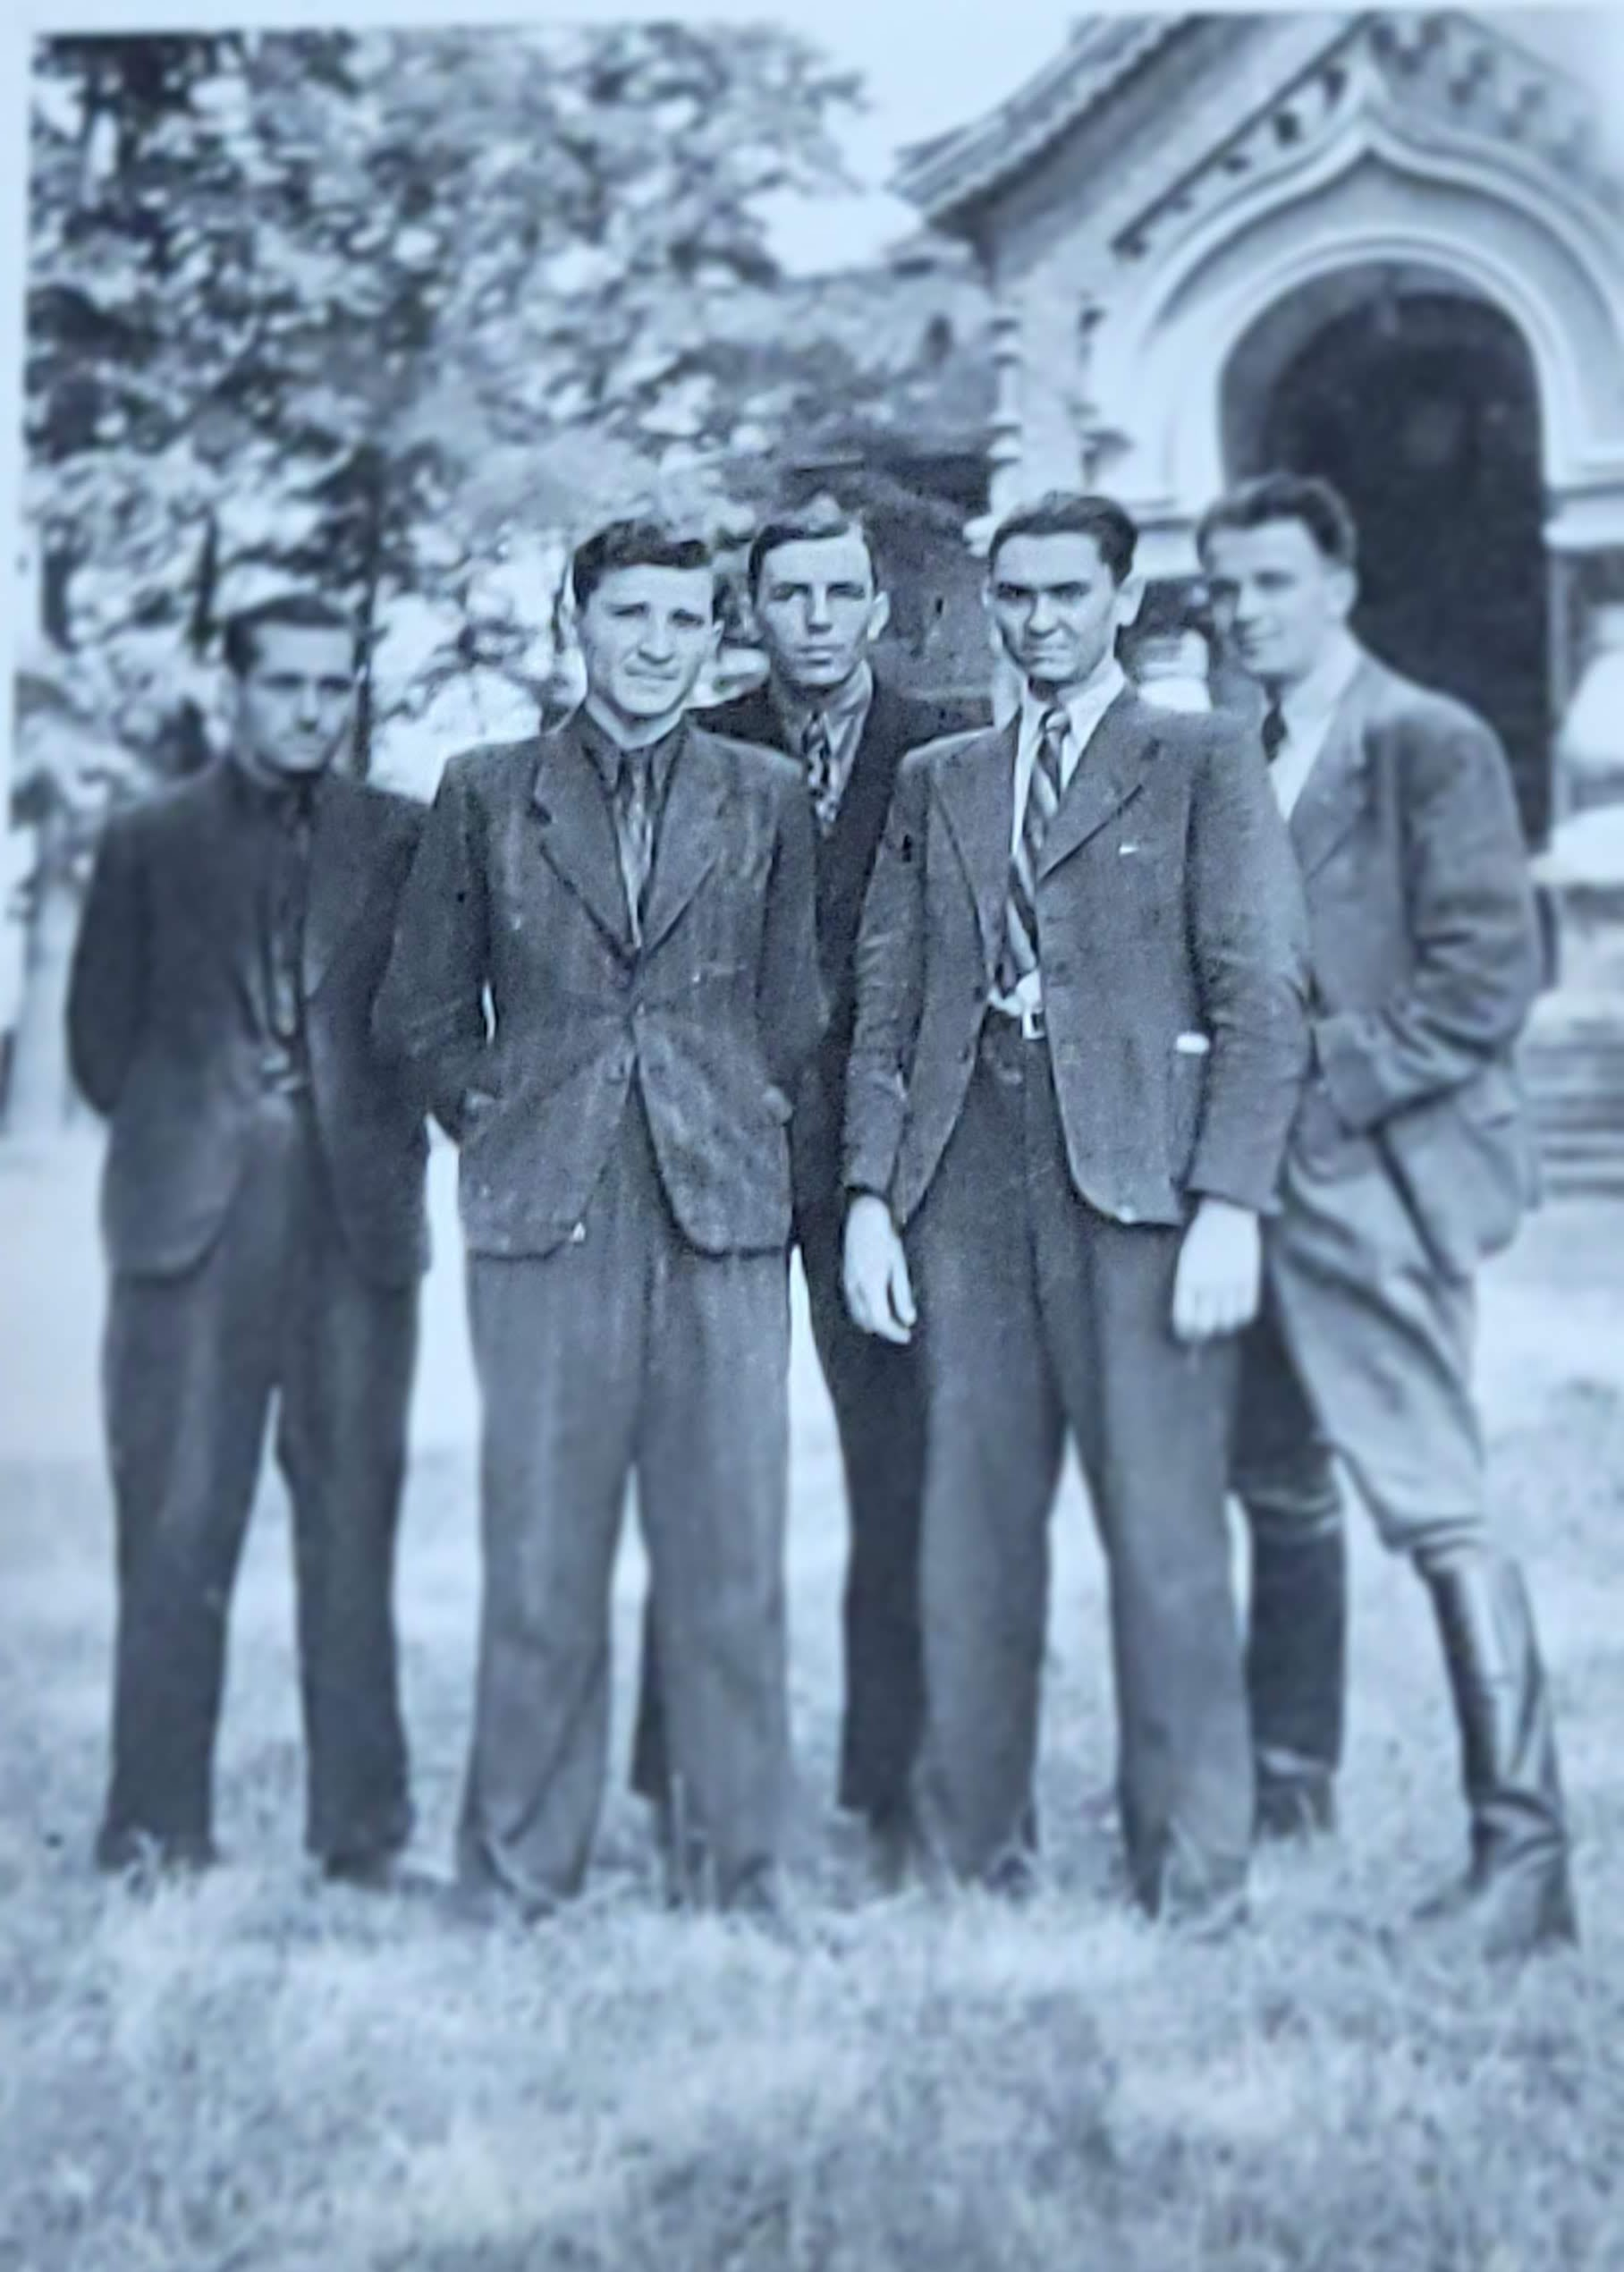 1940s, seminarian friends